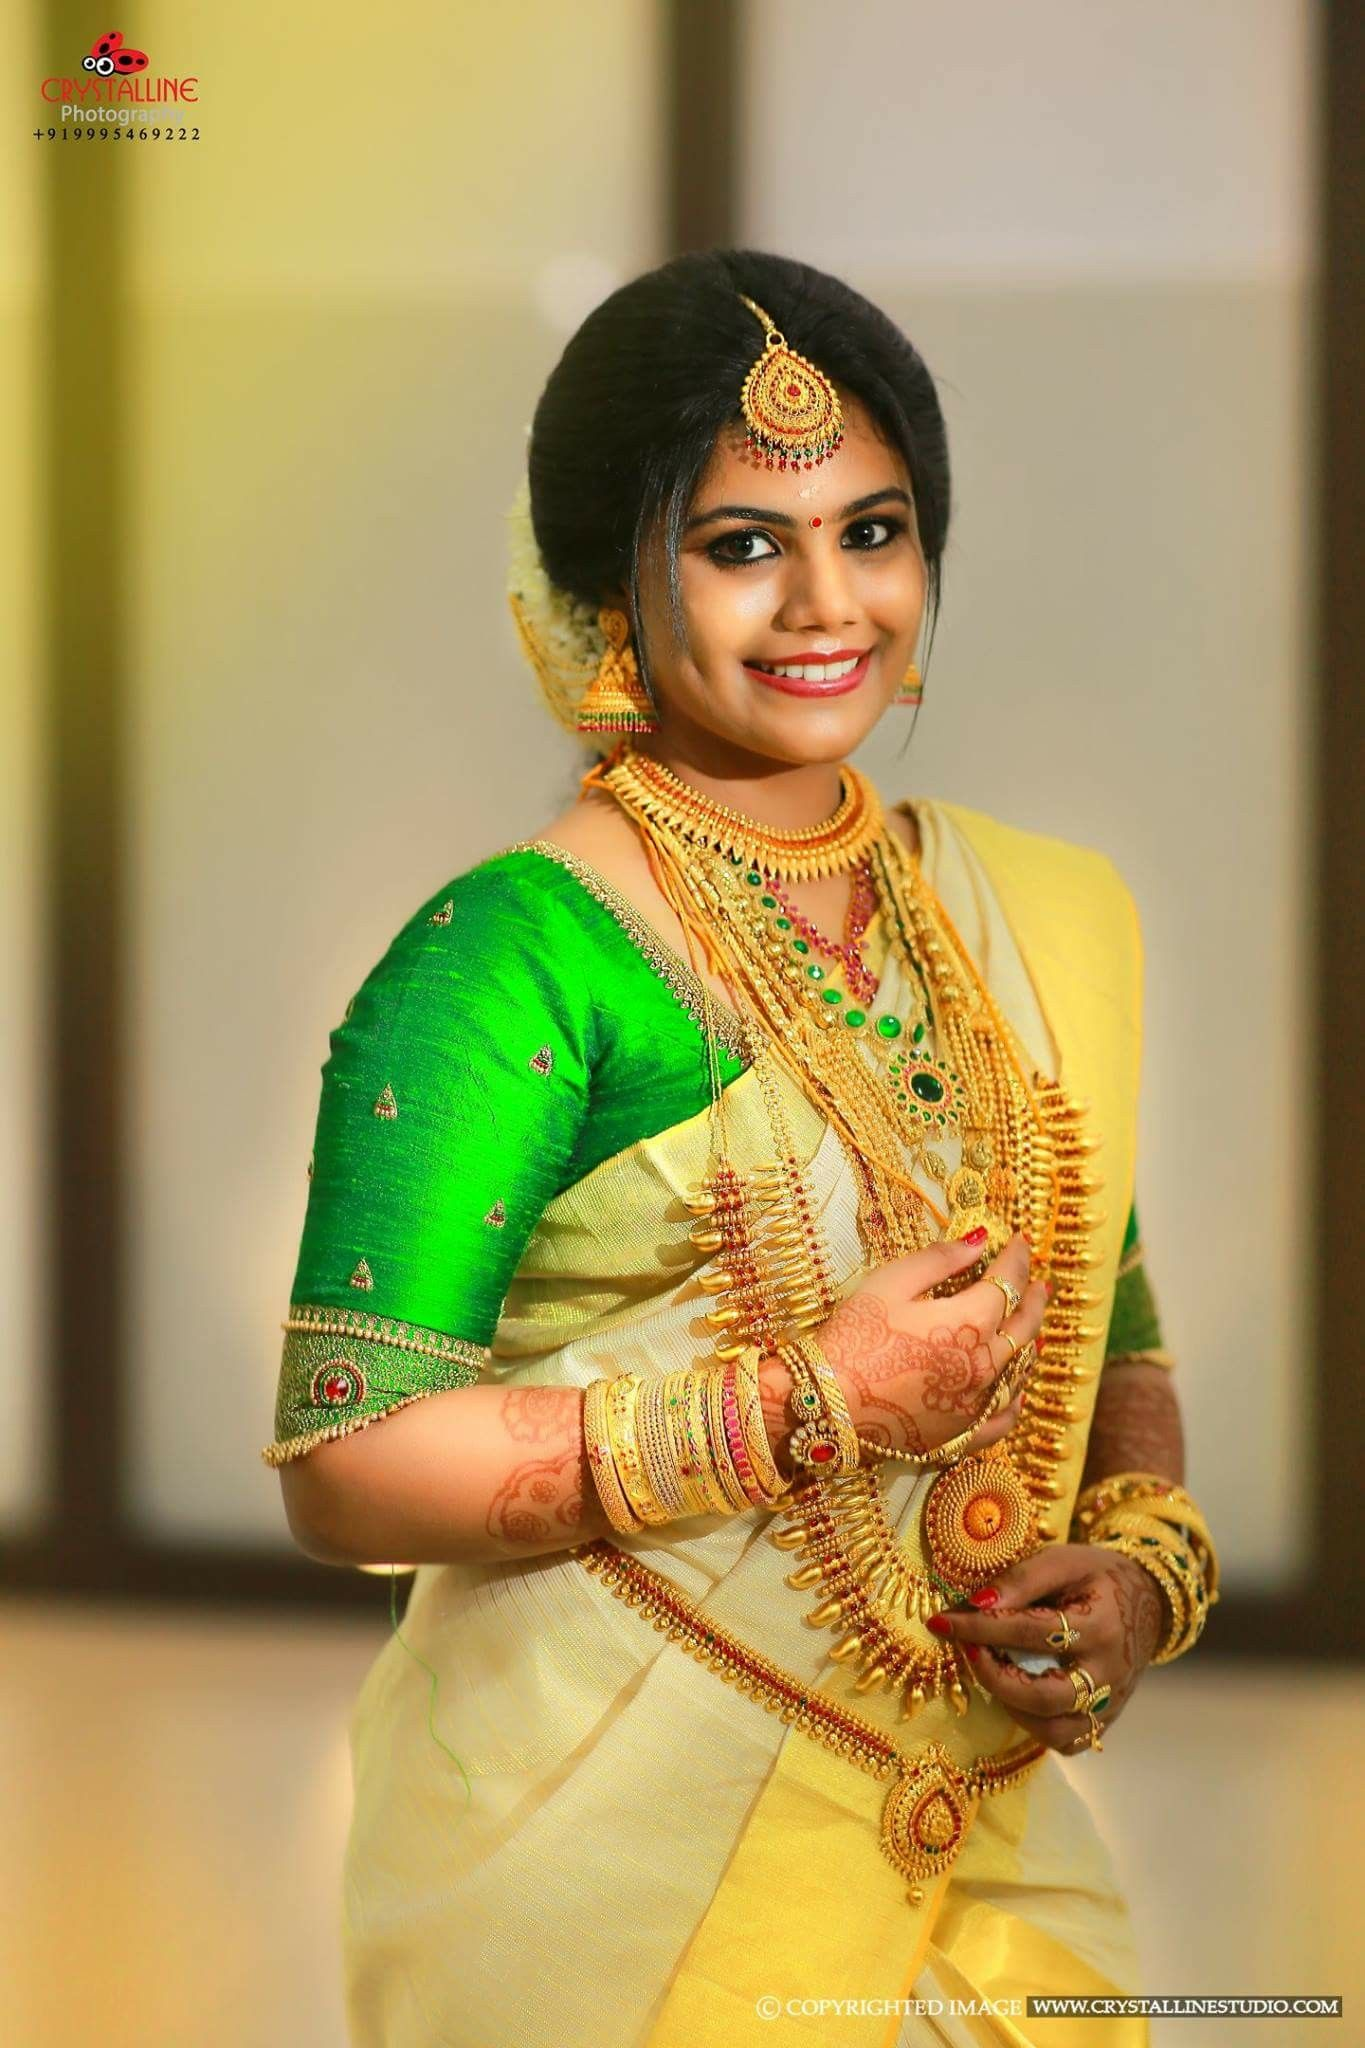 PinterestSnehaNair😎 Kerala bride, Set saree, South